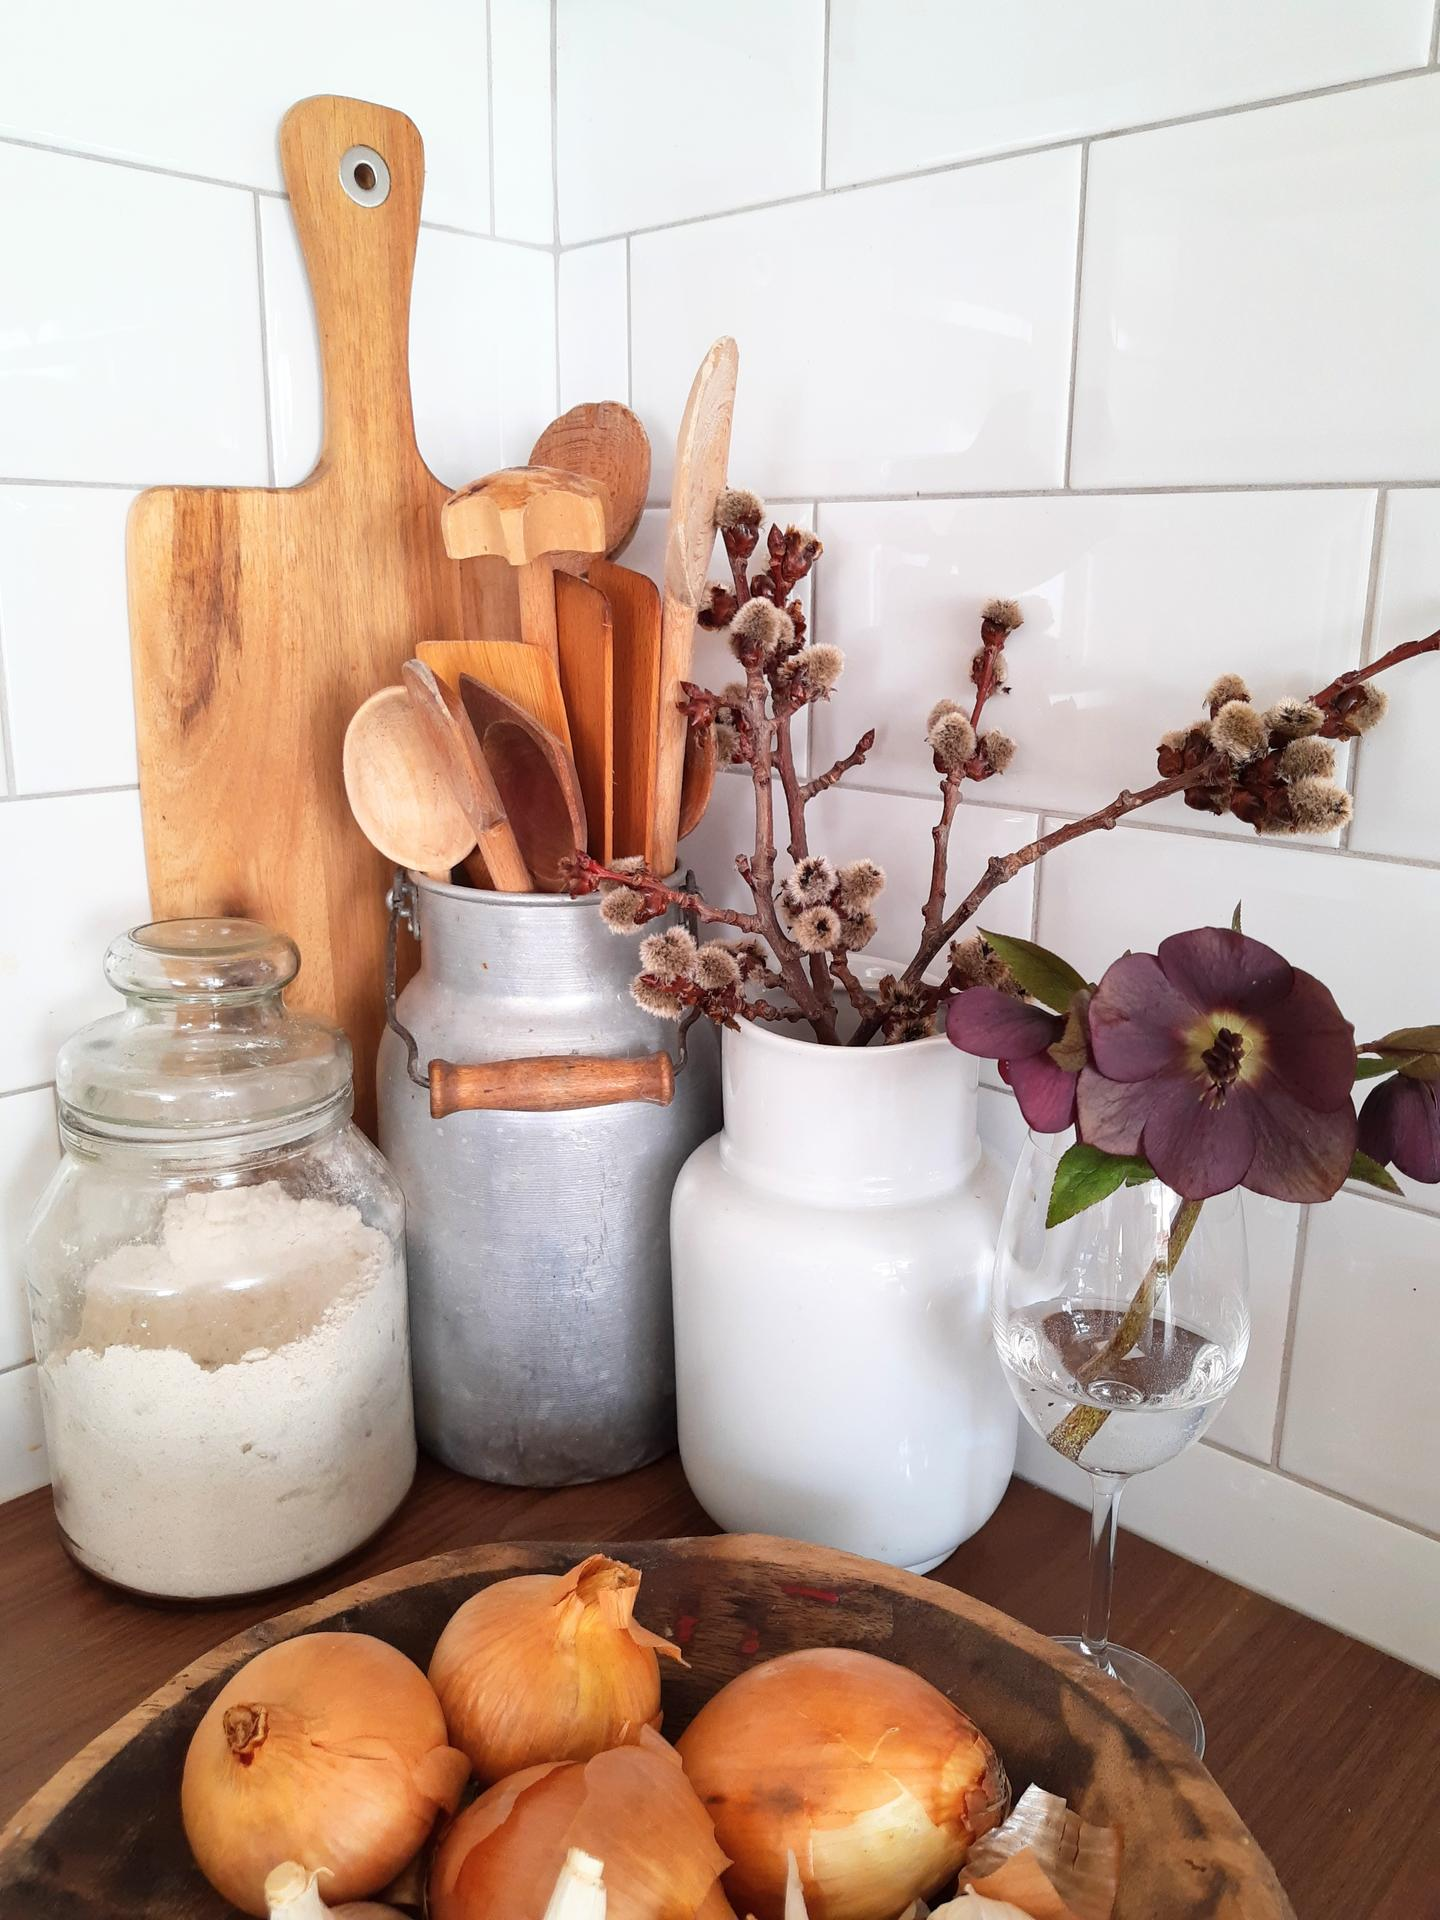 Domov - Jar 😊